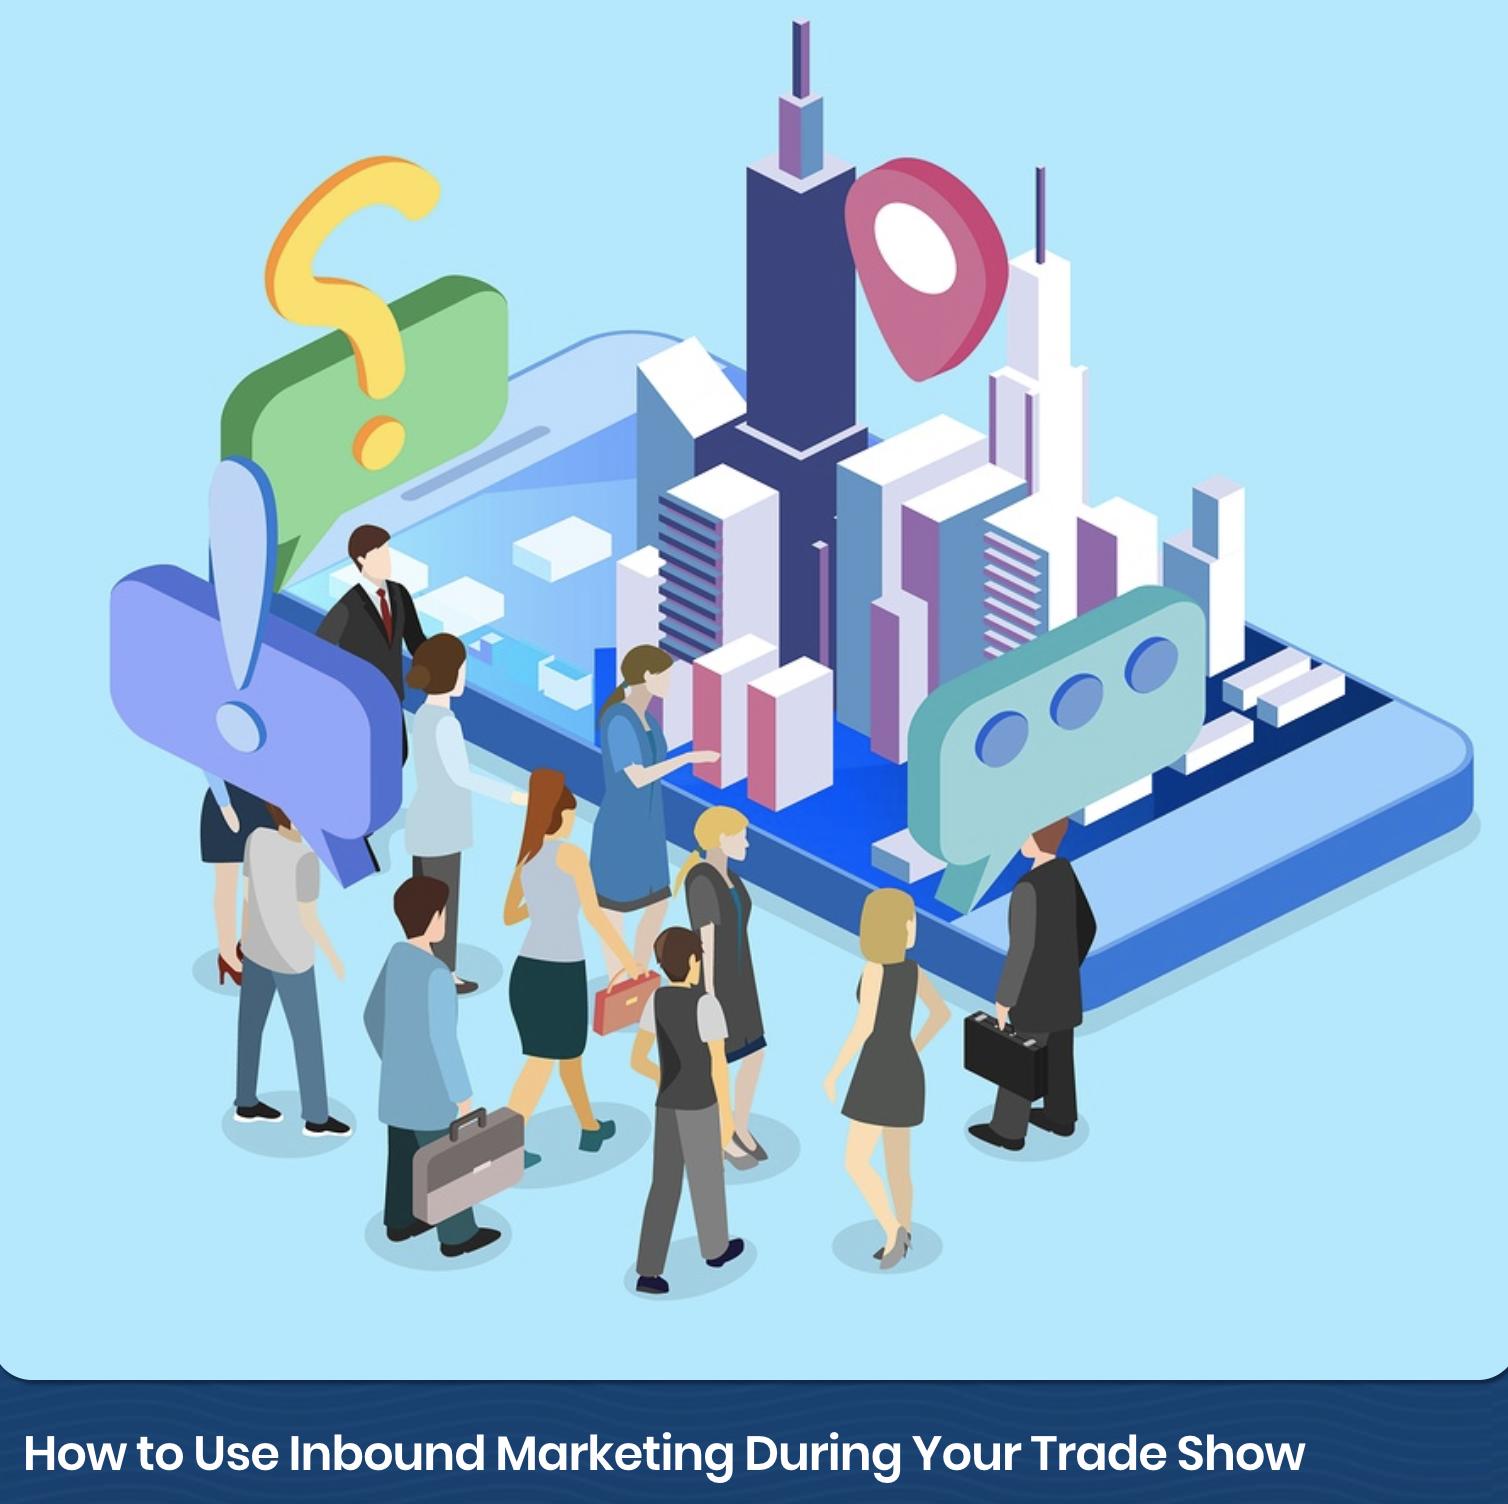 Trade_Show_Inbound_Marketing_at_Trade_Show